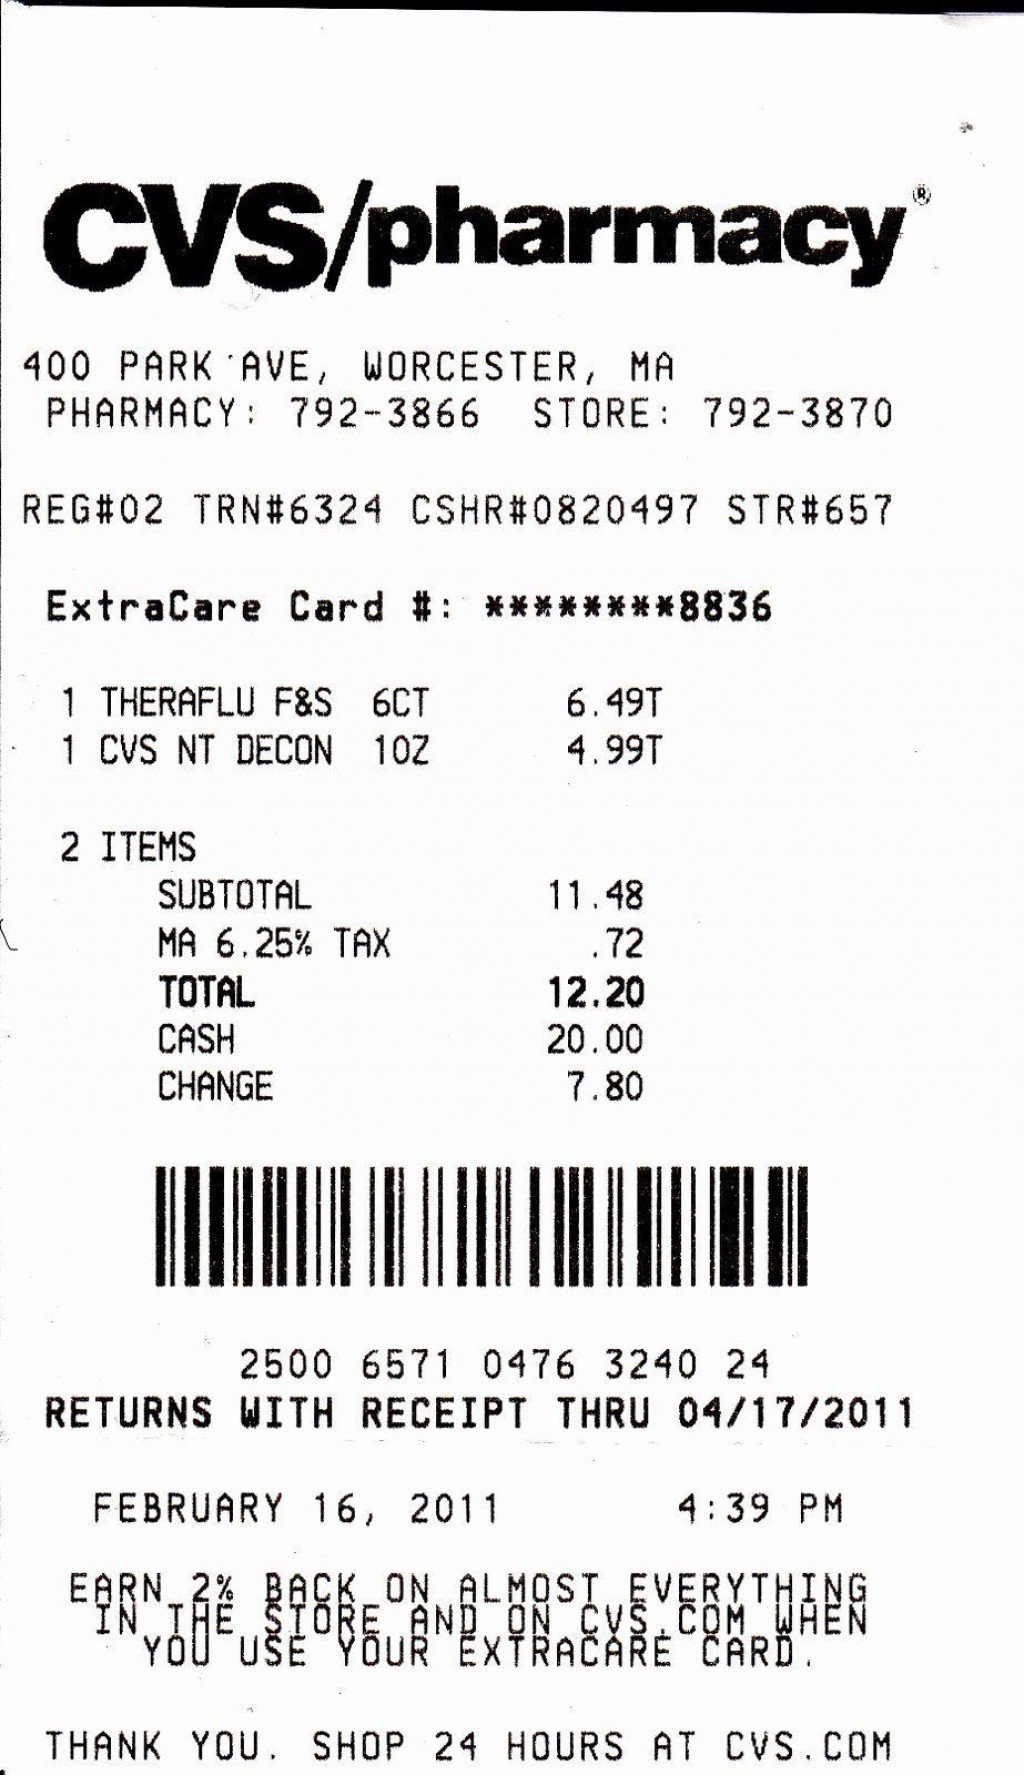 002 Fearsome Fake Prescription Bottle Label Template Picture Large